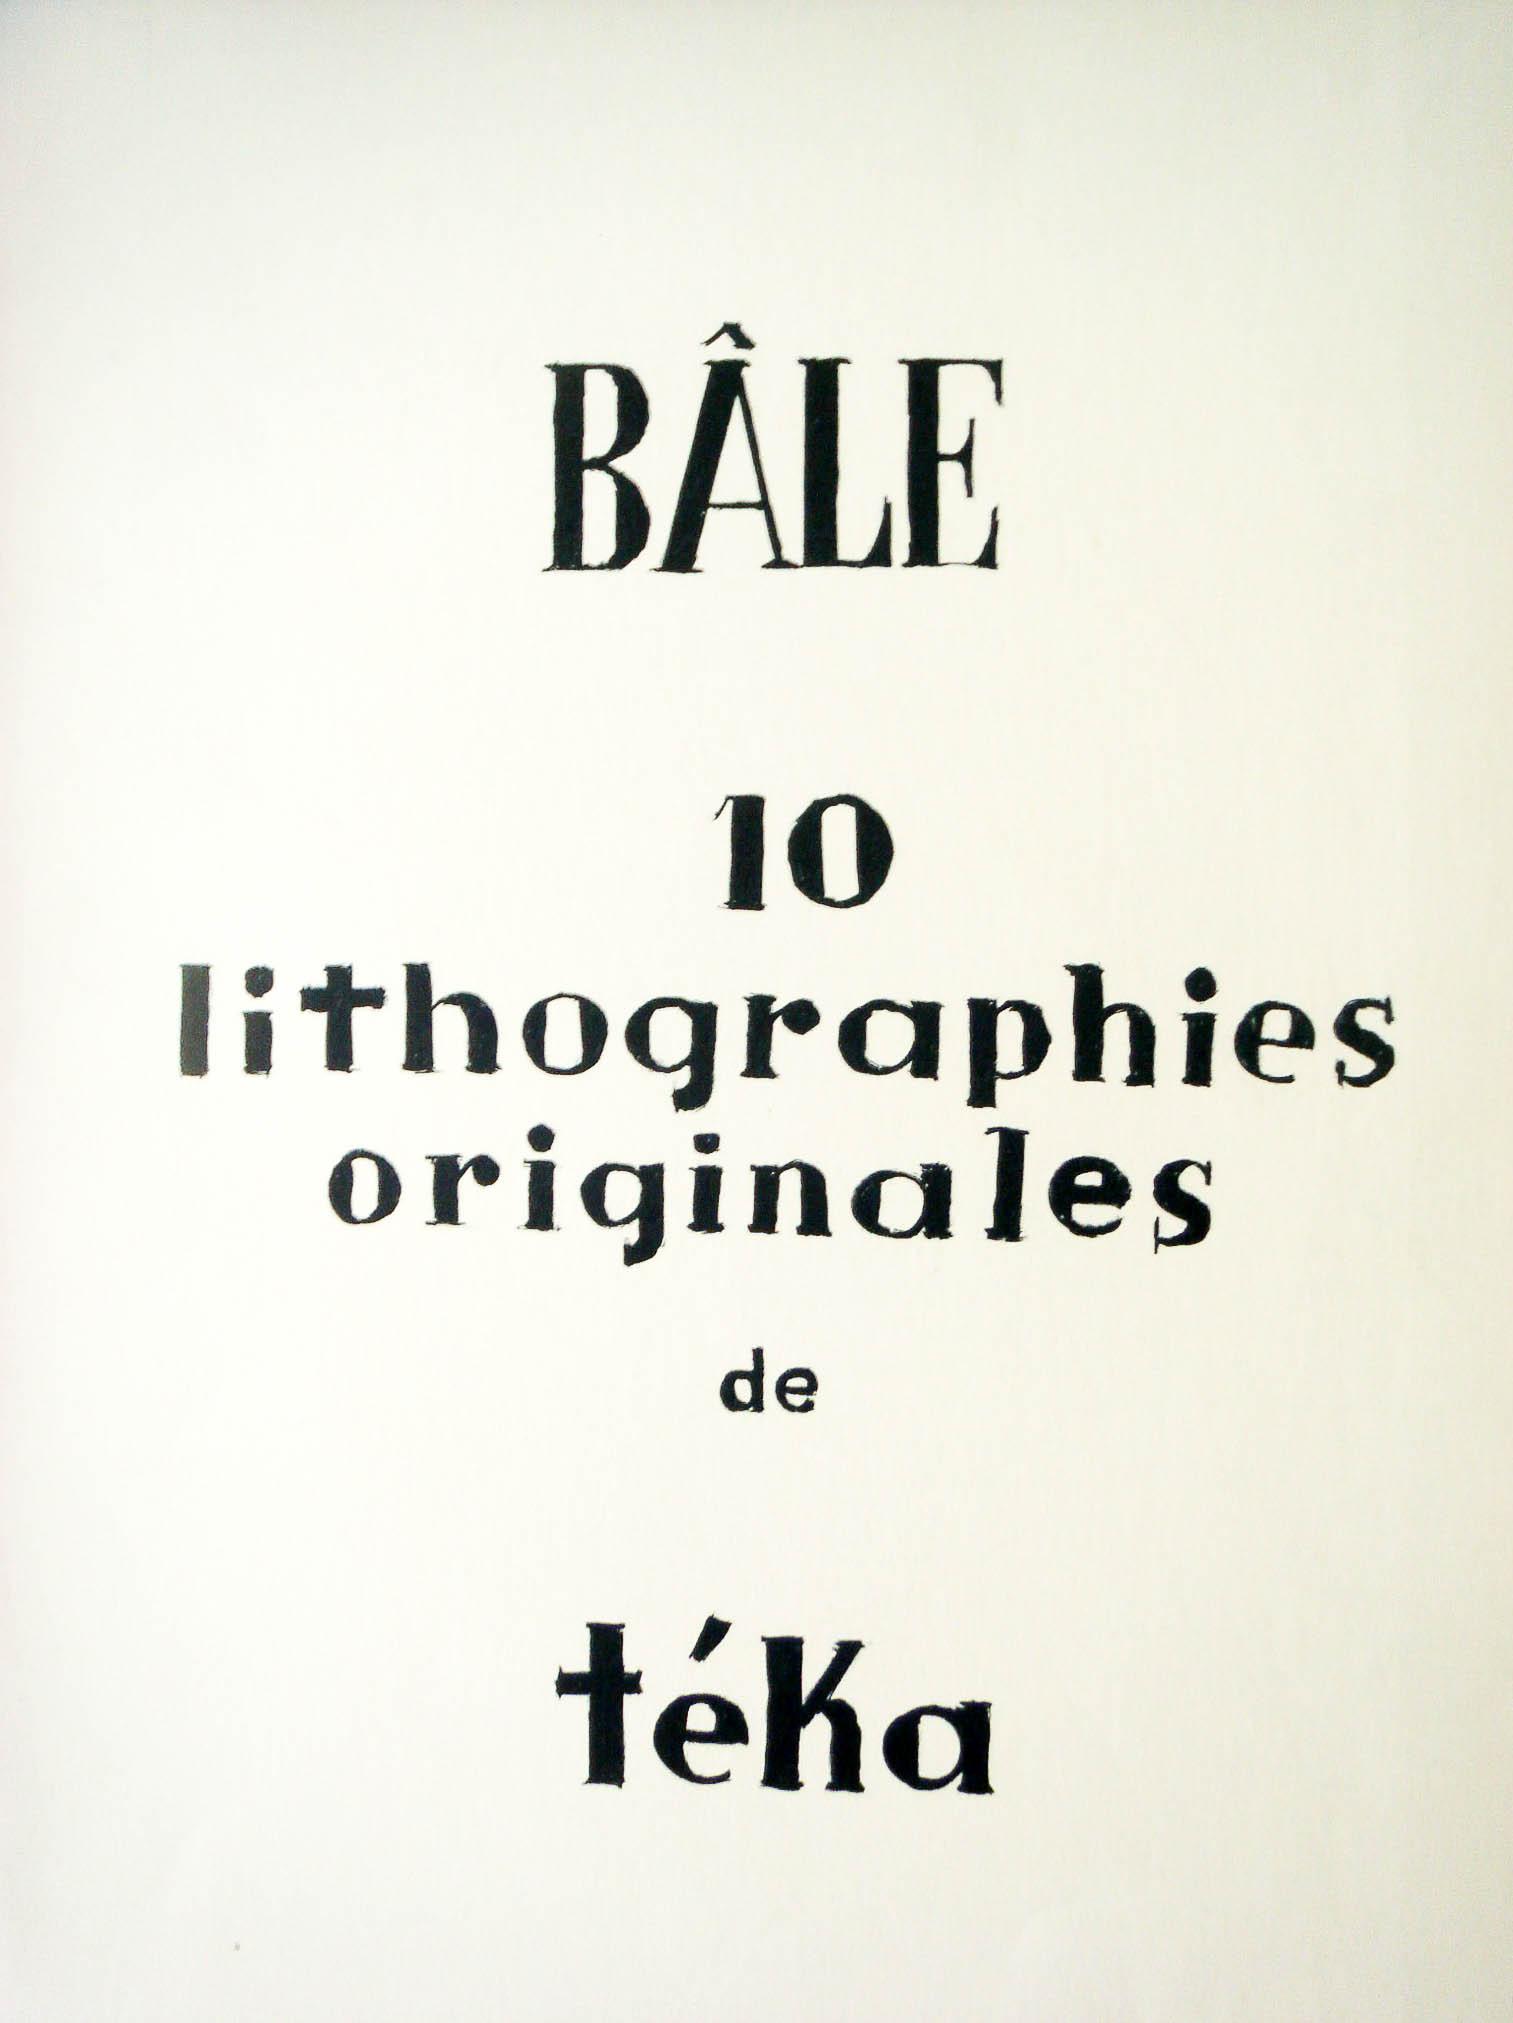 1947  Bâle 00, Alfred Frossard Porrentruy, 1.10.1947